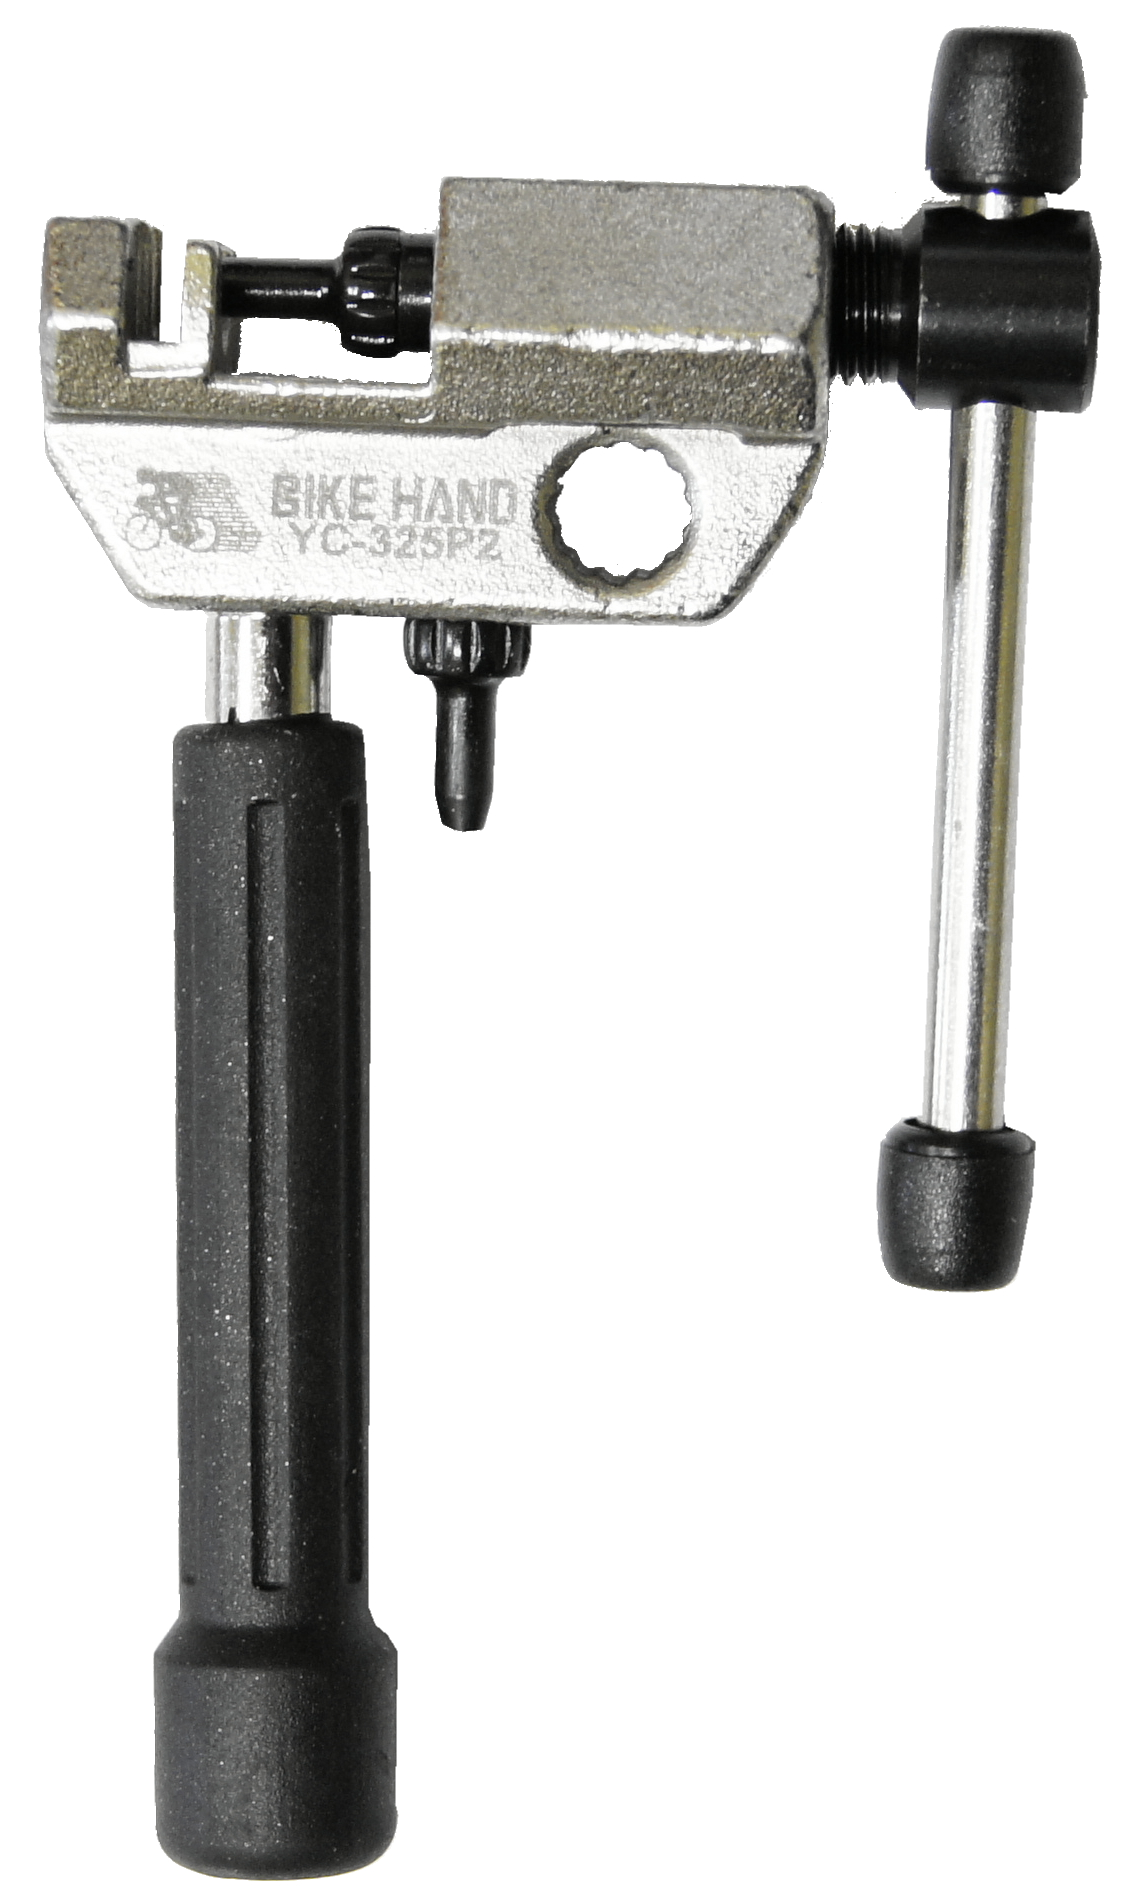 nýtovač řetězu BIKE HAND YC-325-P2